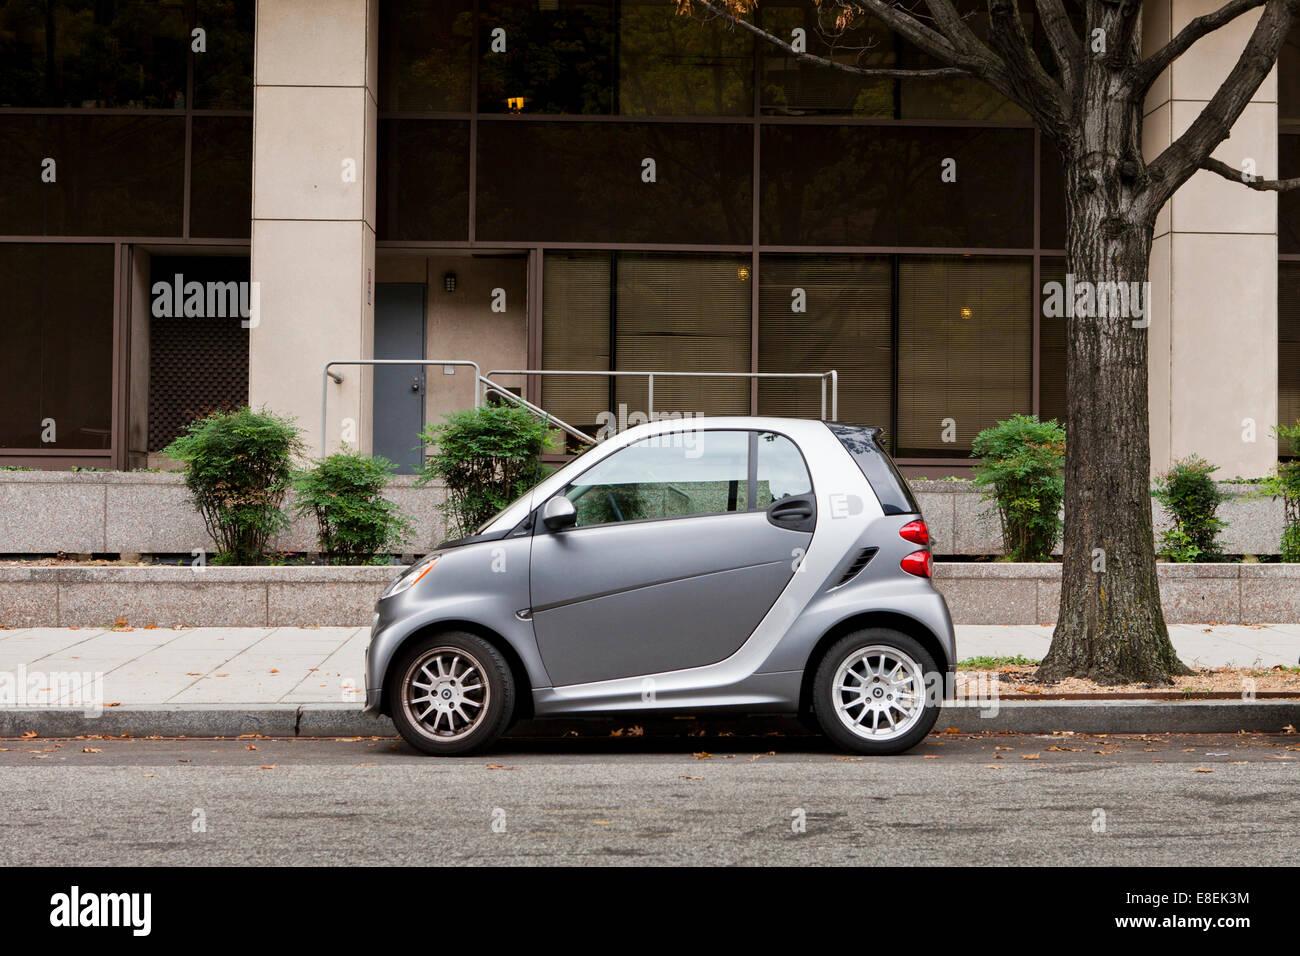 Parked SmartCar - USA - Stock Image